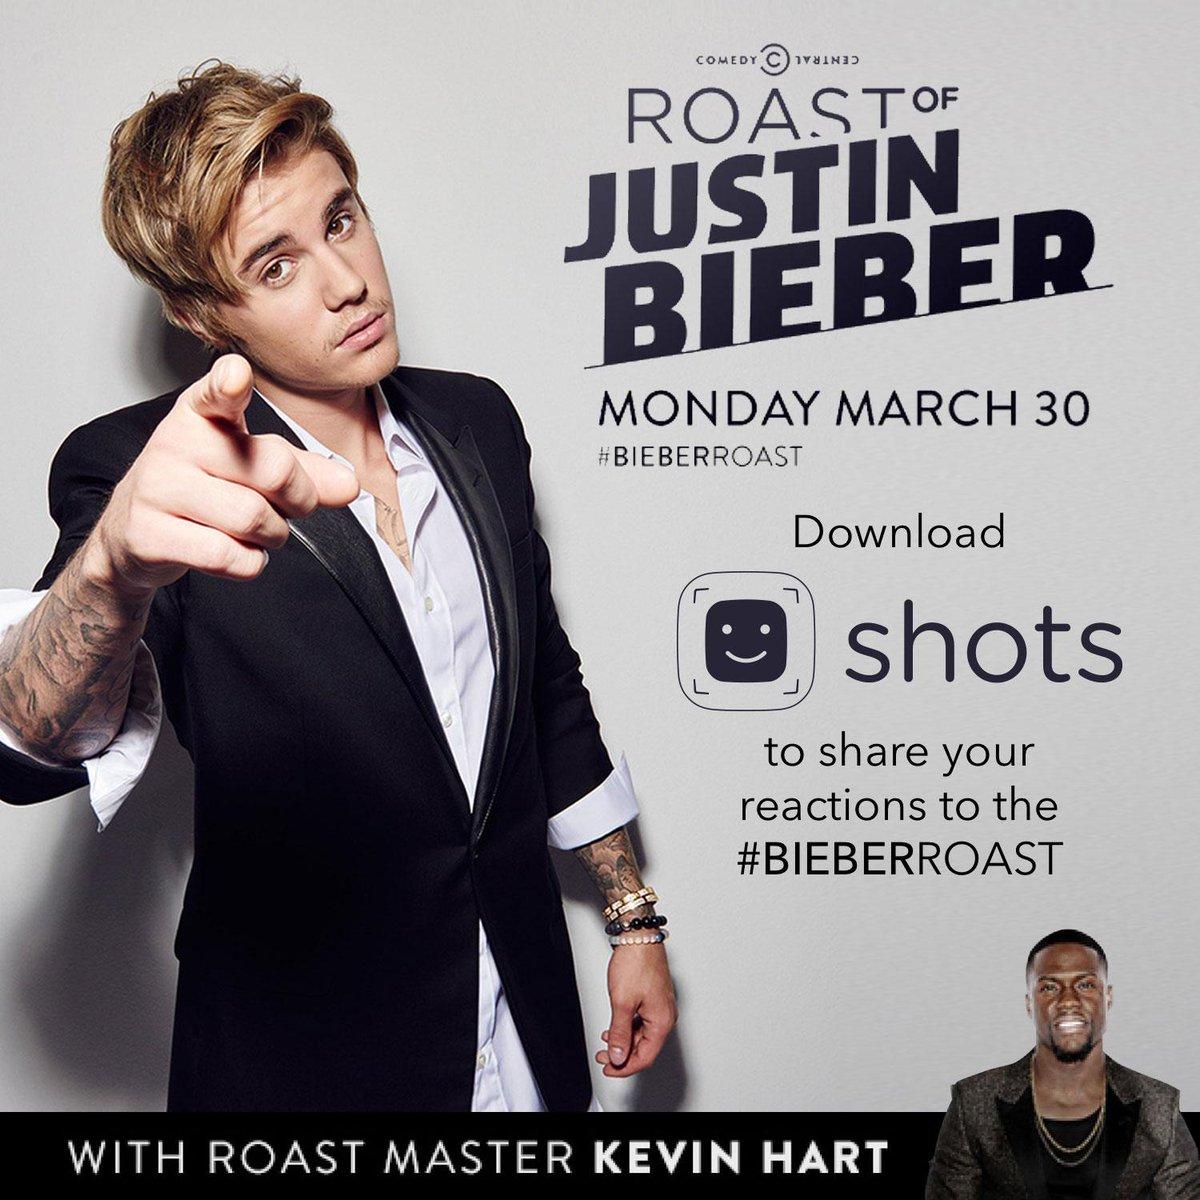 #BIEBERROAST is tonight! Share your reactions on @Shots!! http://t.co/9tSCiZlkoU